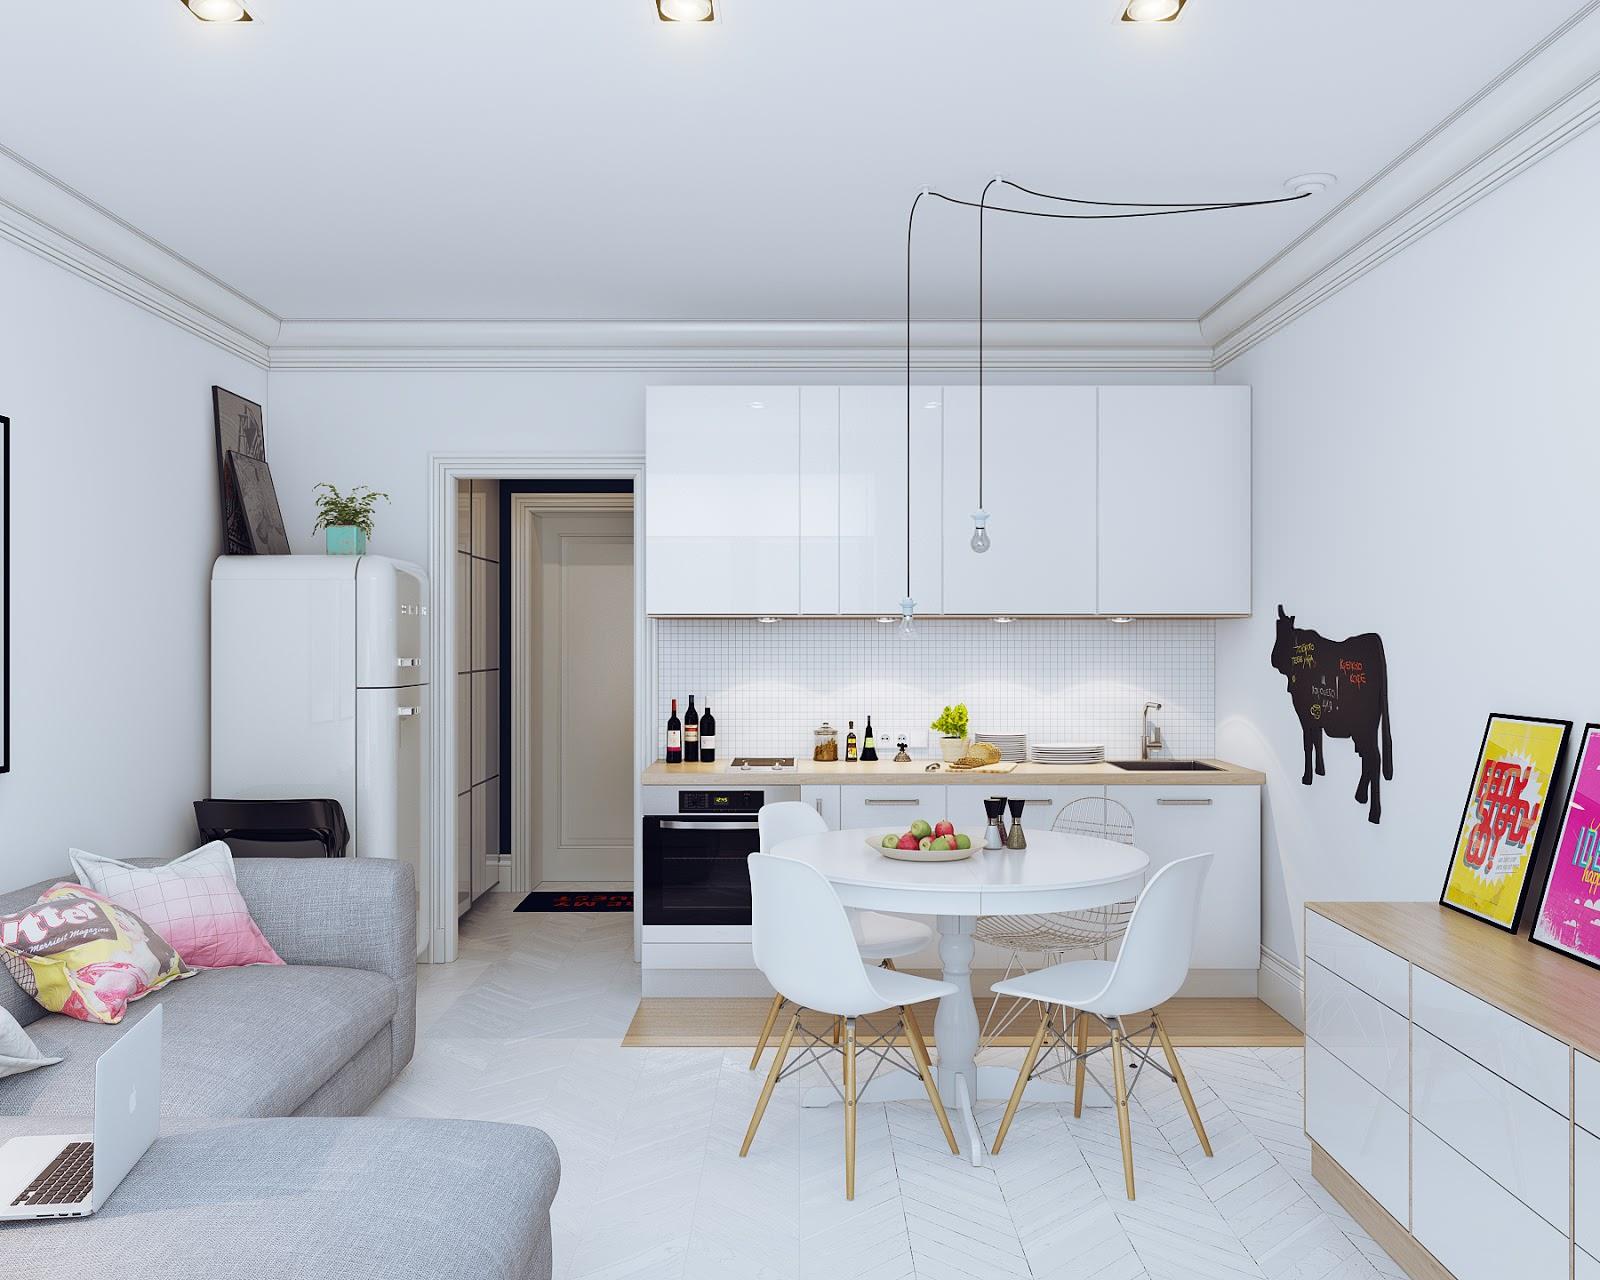 Дизайн квартиры-студии 24 кв. М youtube.